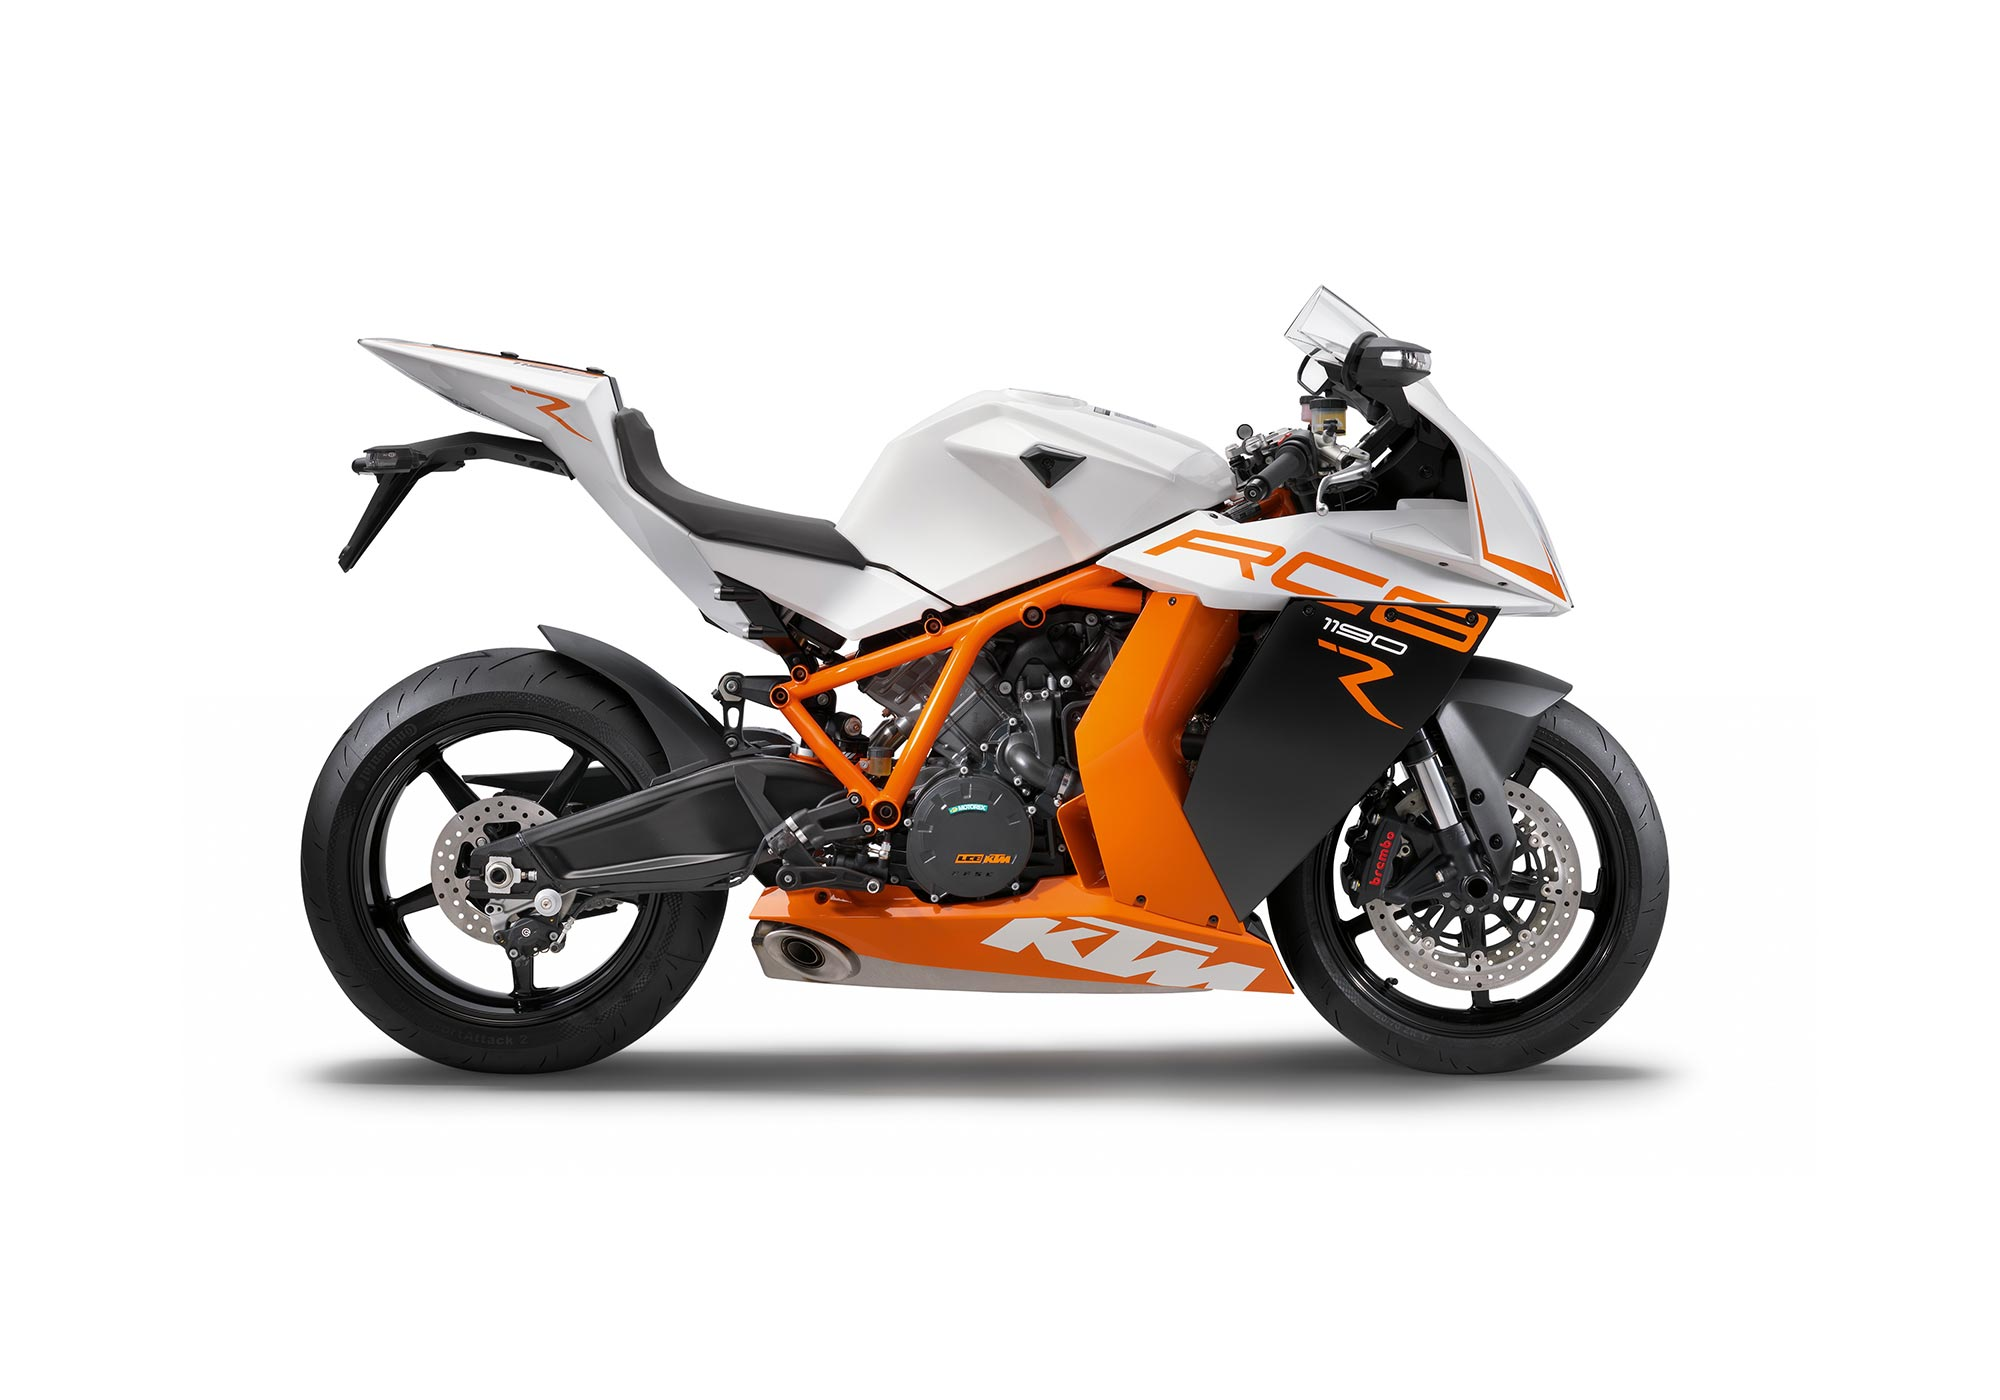 KTM RC25 - A KTM 250cc Sport Bike Coming from India? - Asphalt & Rubber